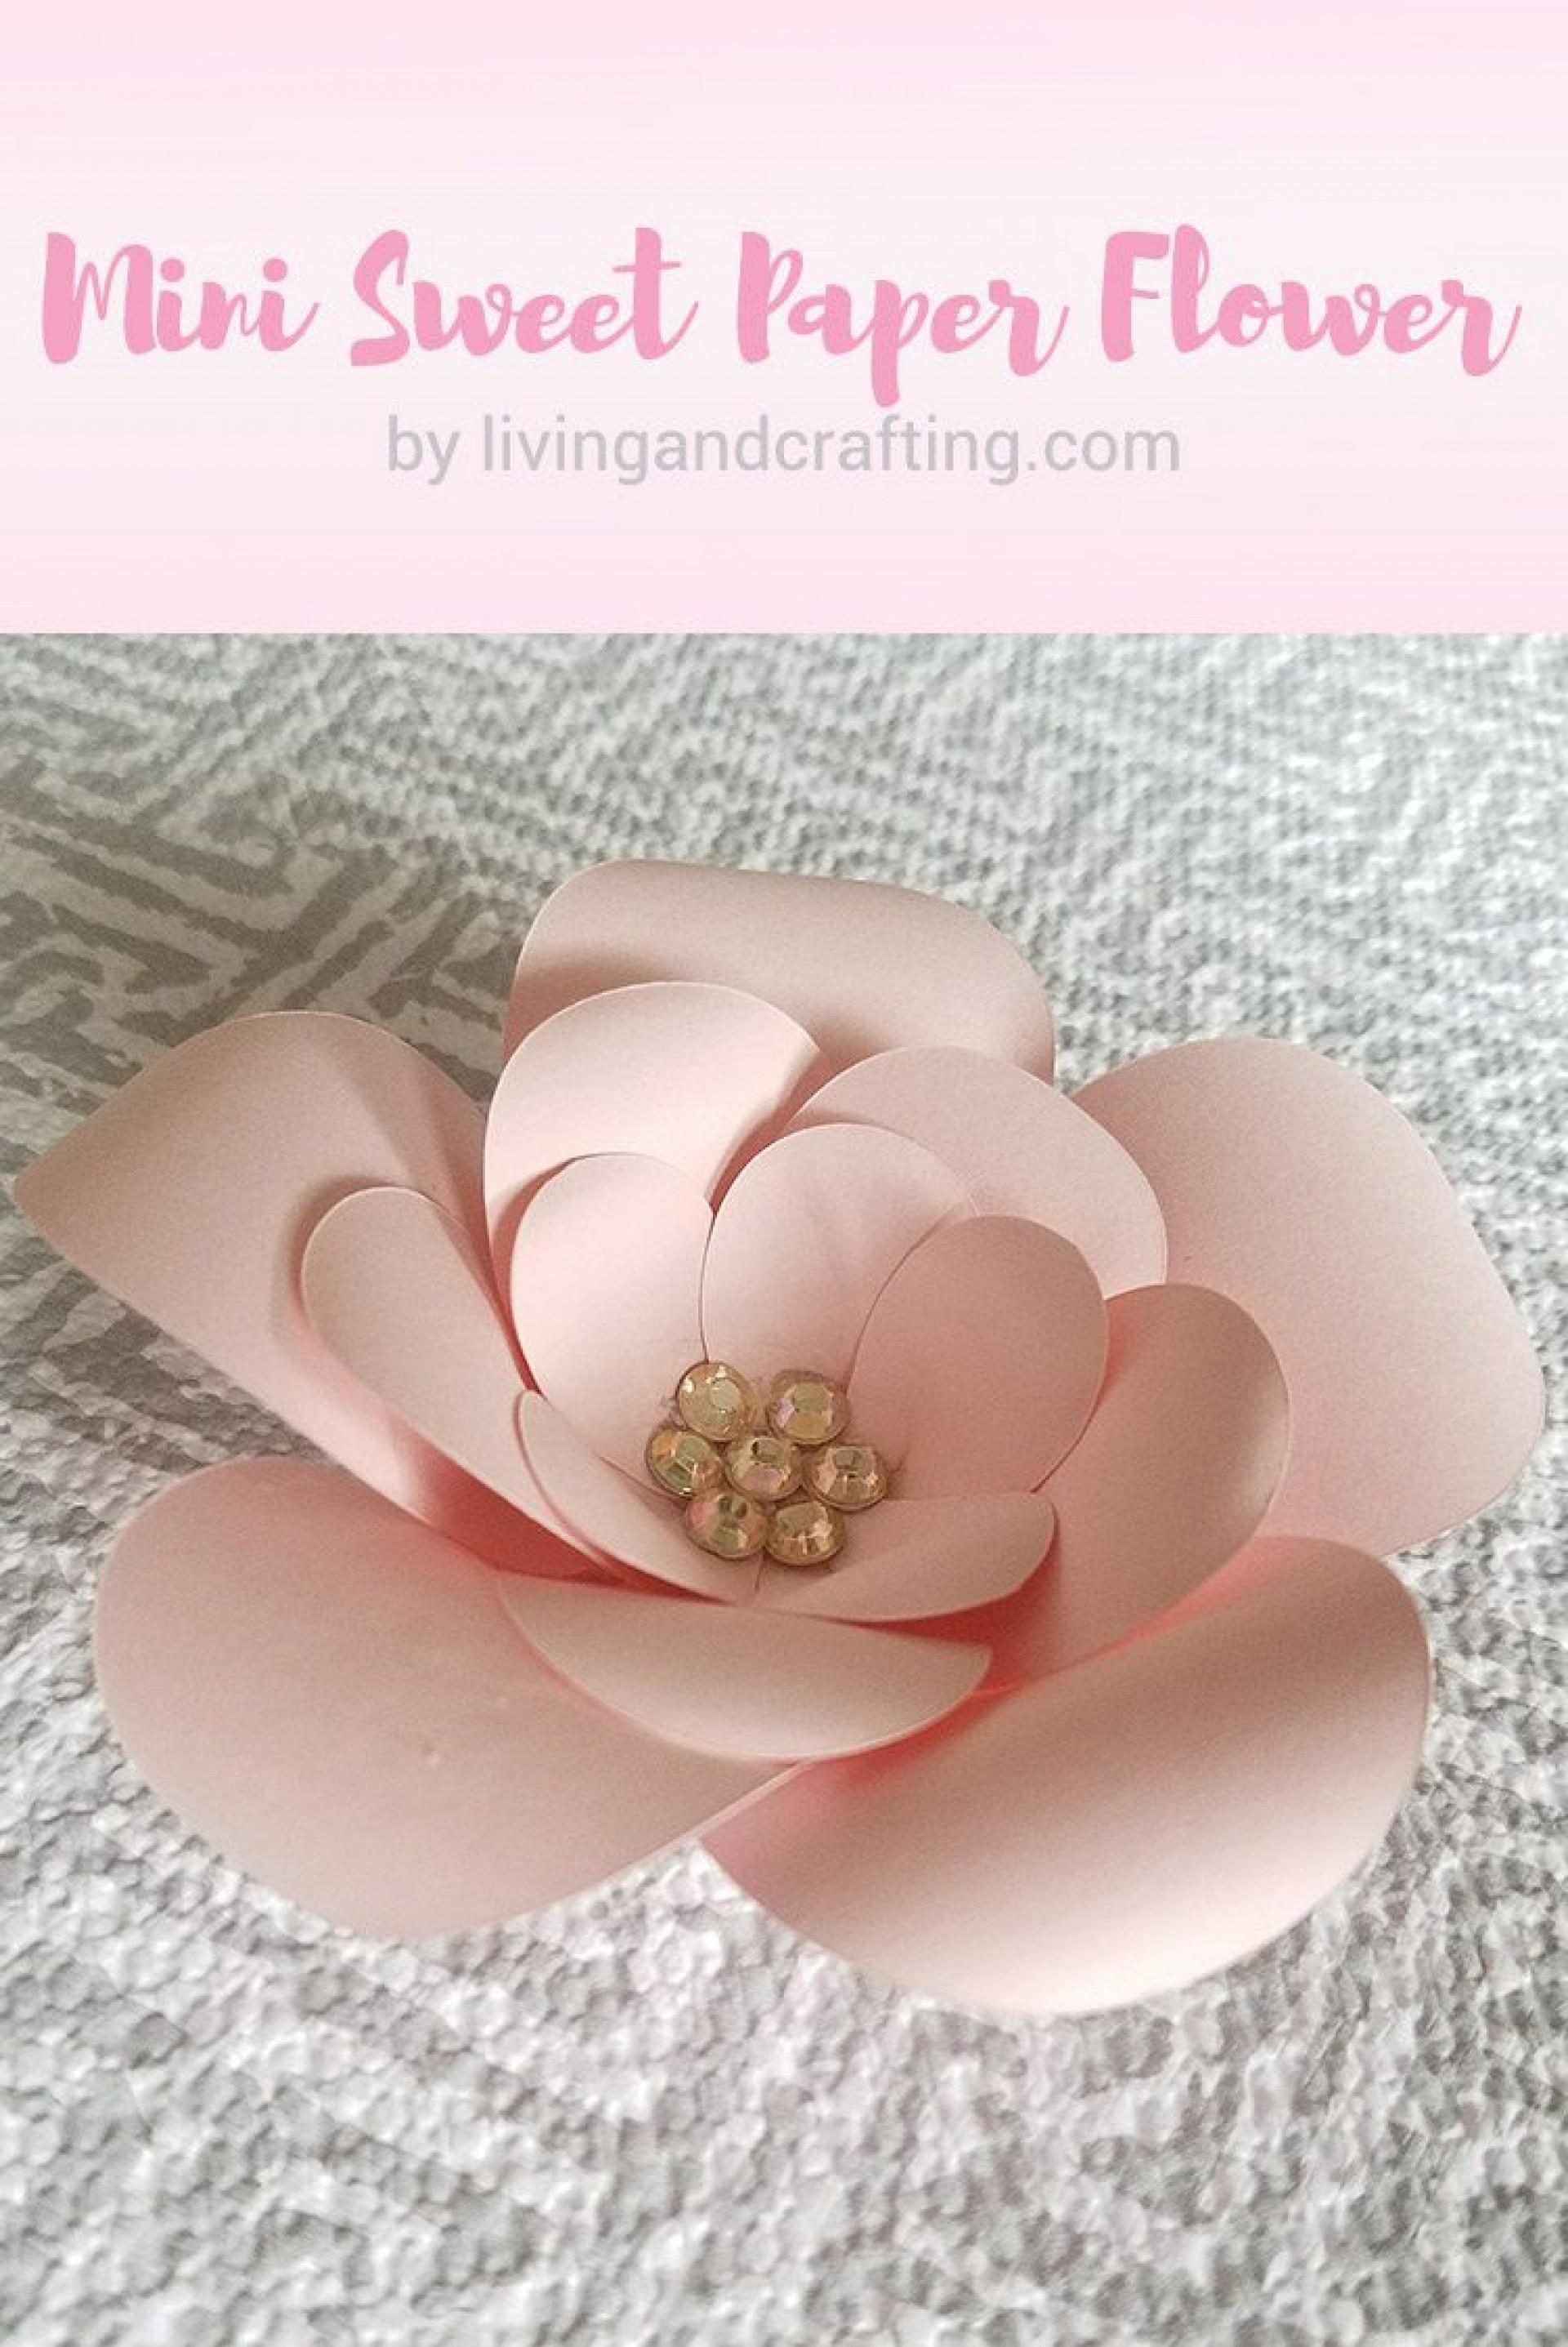 006 Wonderful Free Printable Diy Paper Flower Template Inspiration  Templates1920